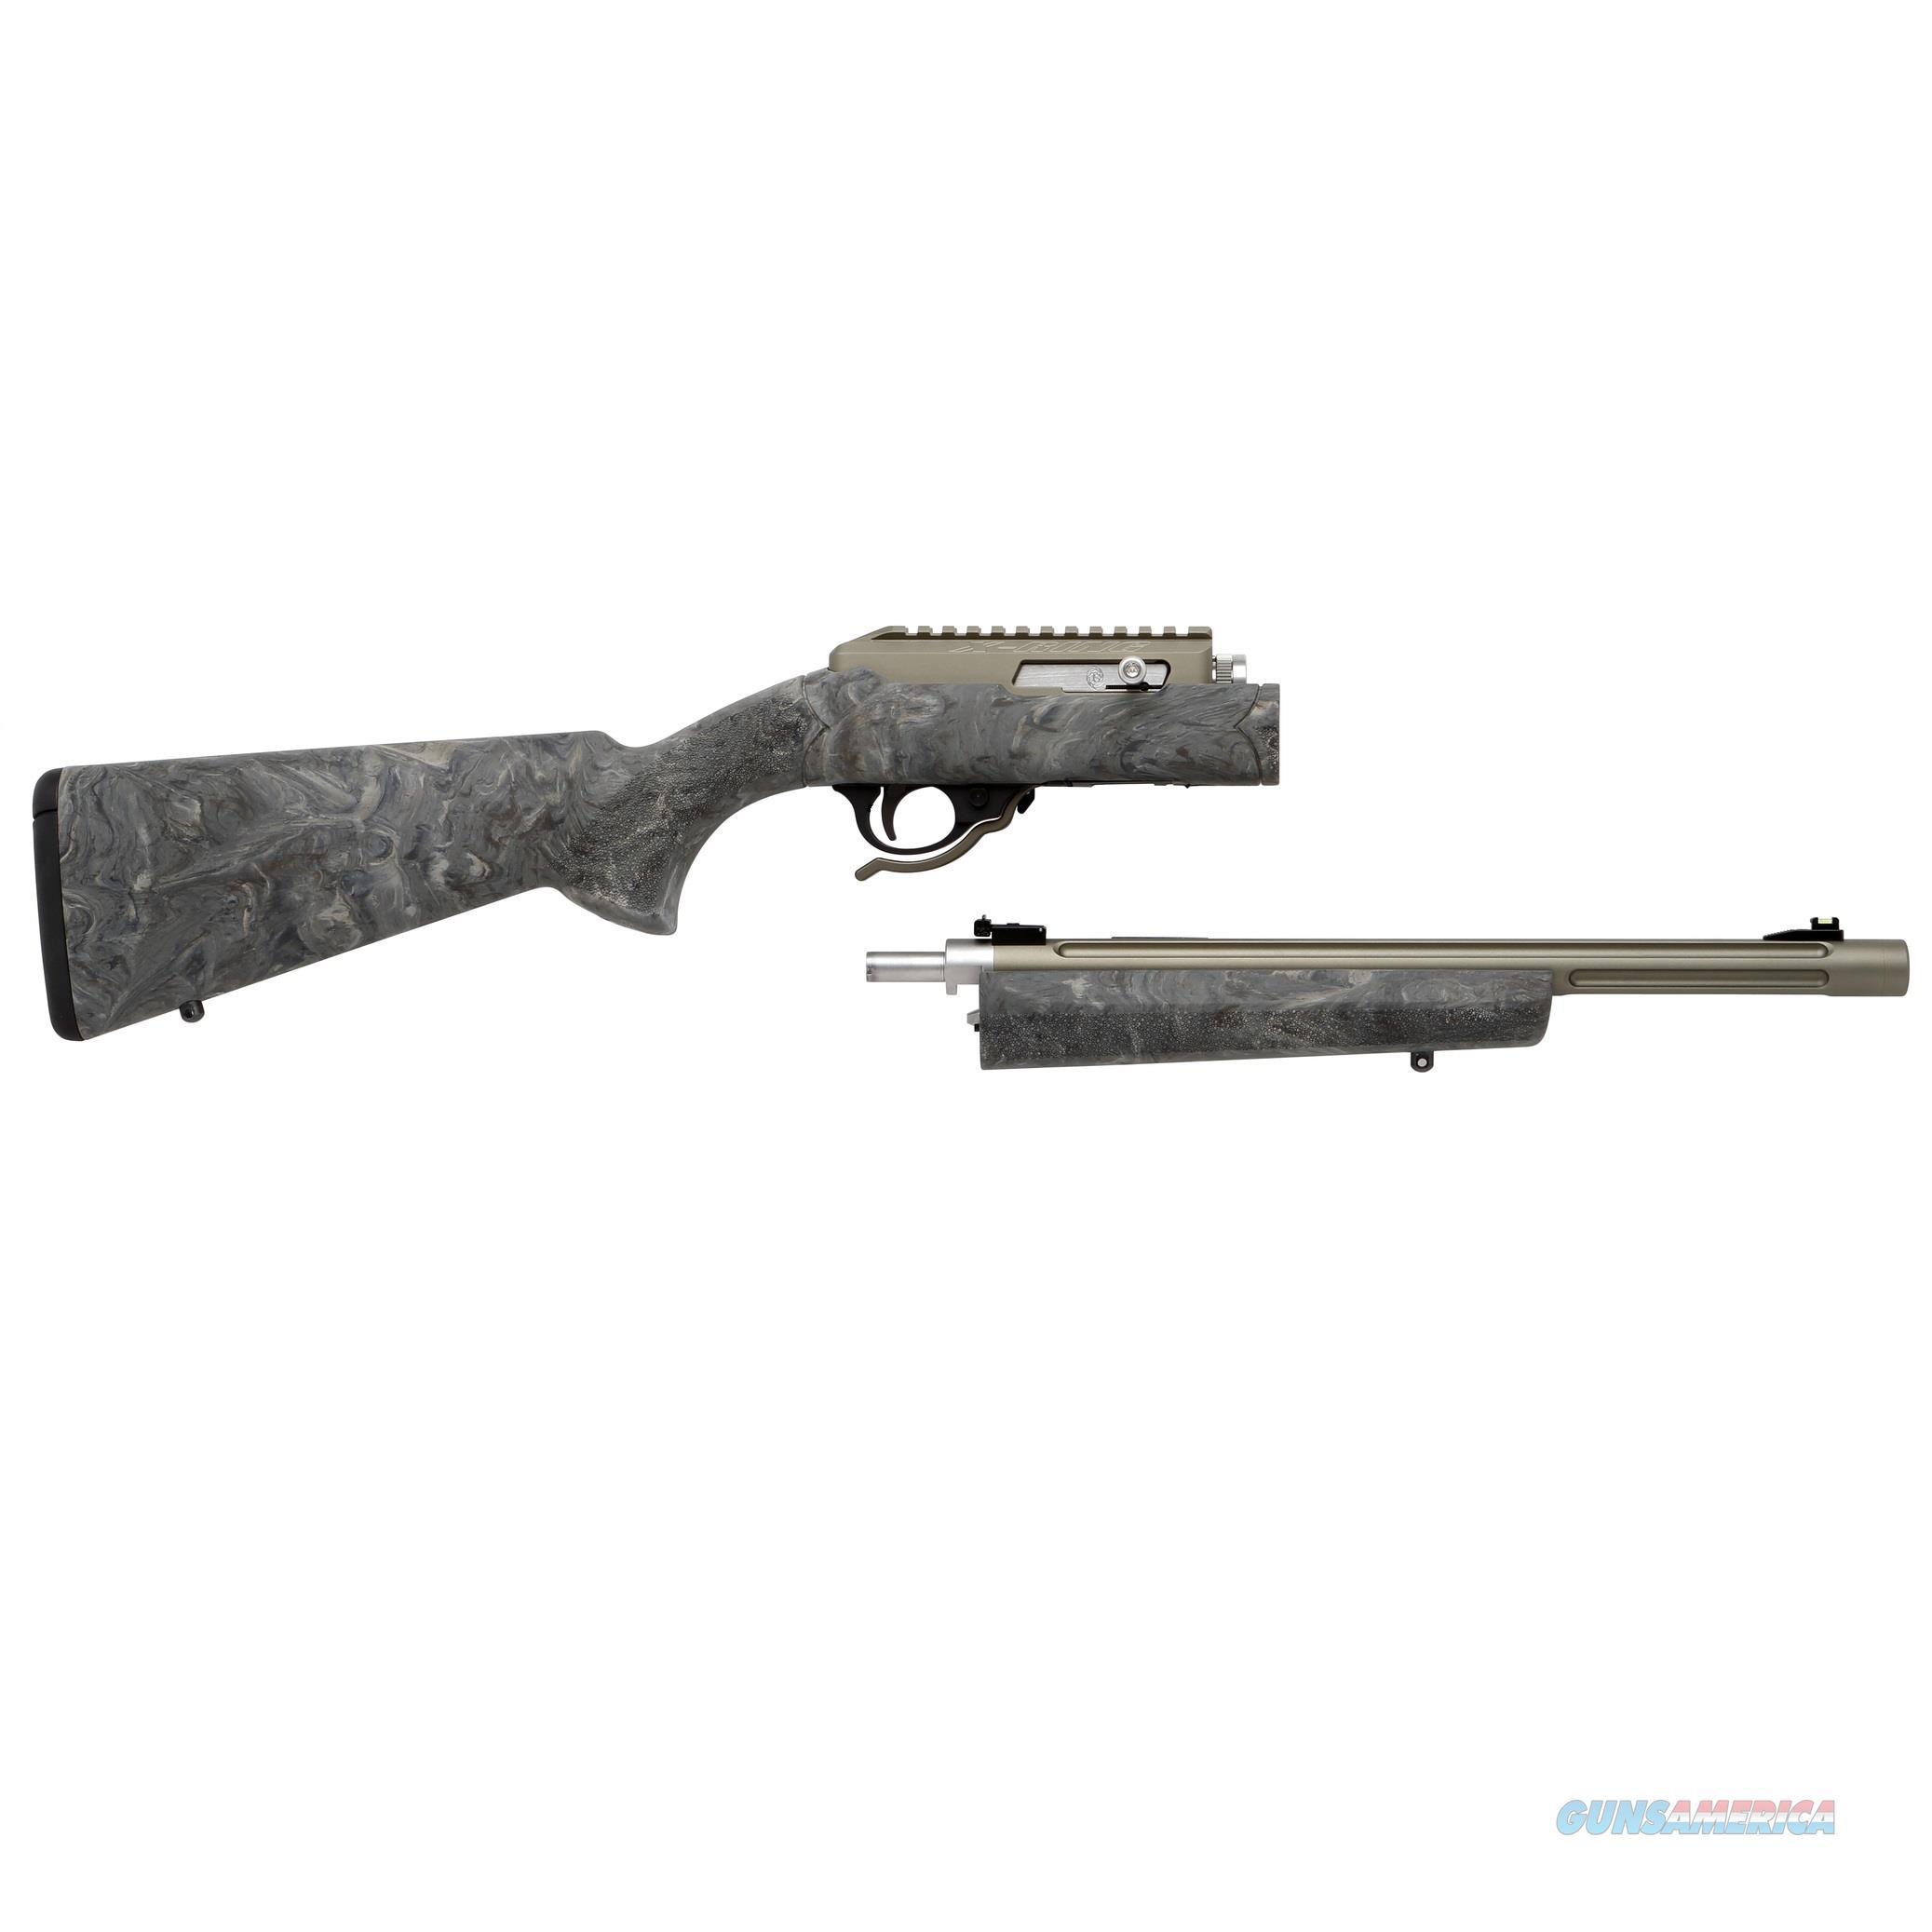 TACTICAL SOLUTIONS X-RING TAKEDOWN RIFLE HOGUE MATTE OD GREEN GHILLE 10/22 .22 LR TD-MOD-B-H-GGRN  Guns > Rifles > Ruger Rifles > 10-22